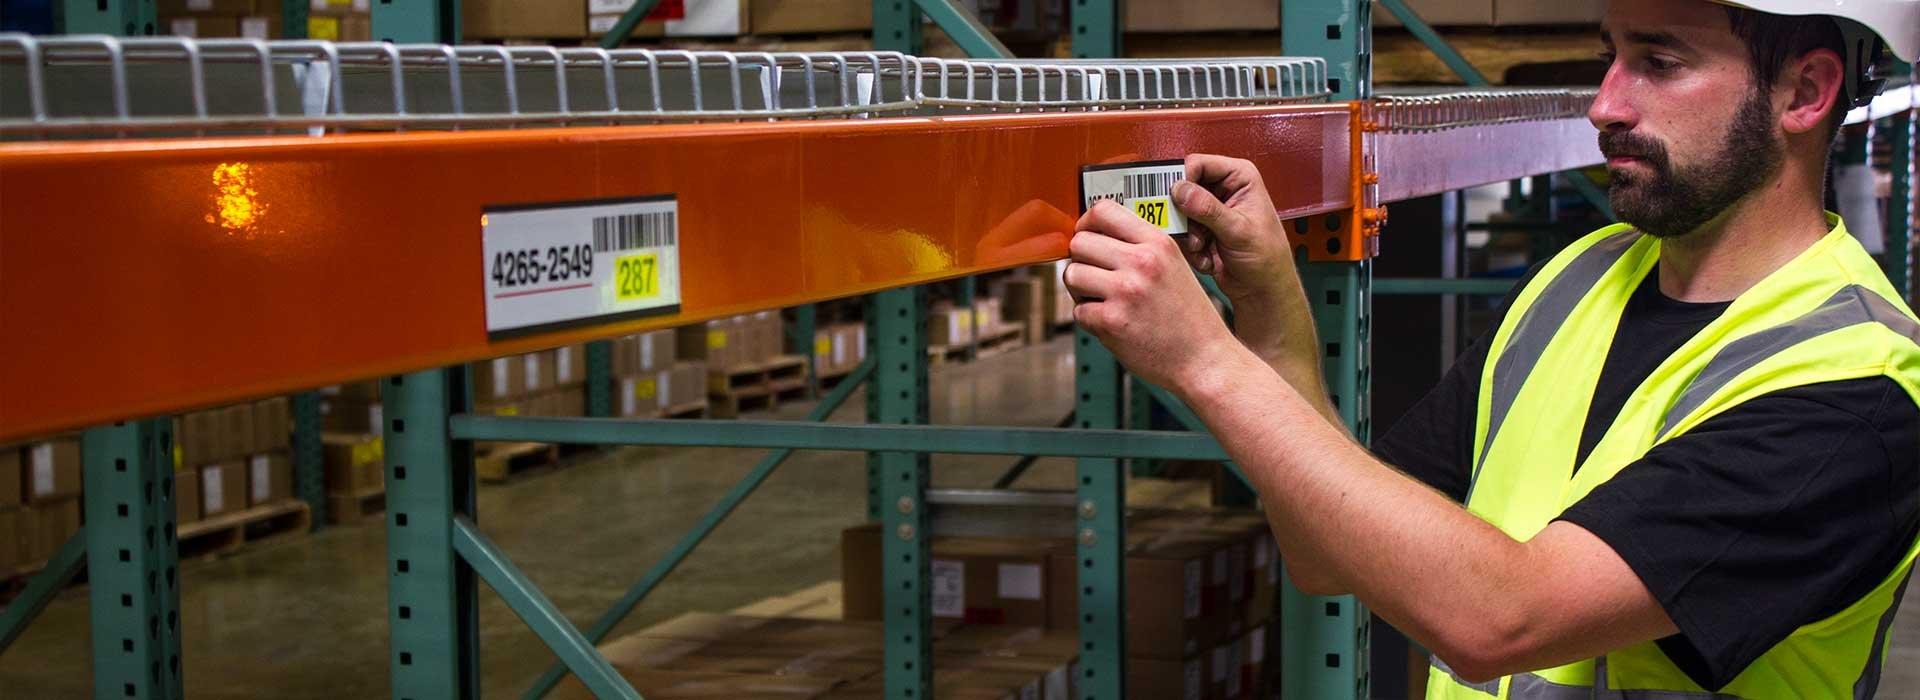 applying_label_to_warehouse_racking